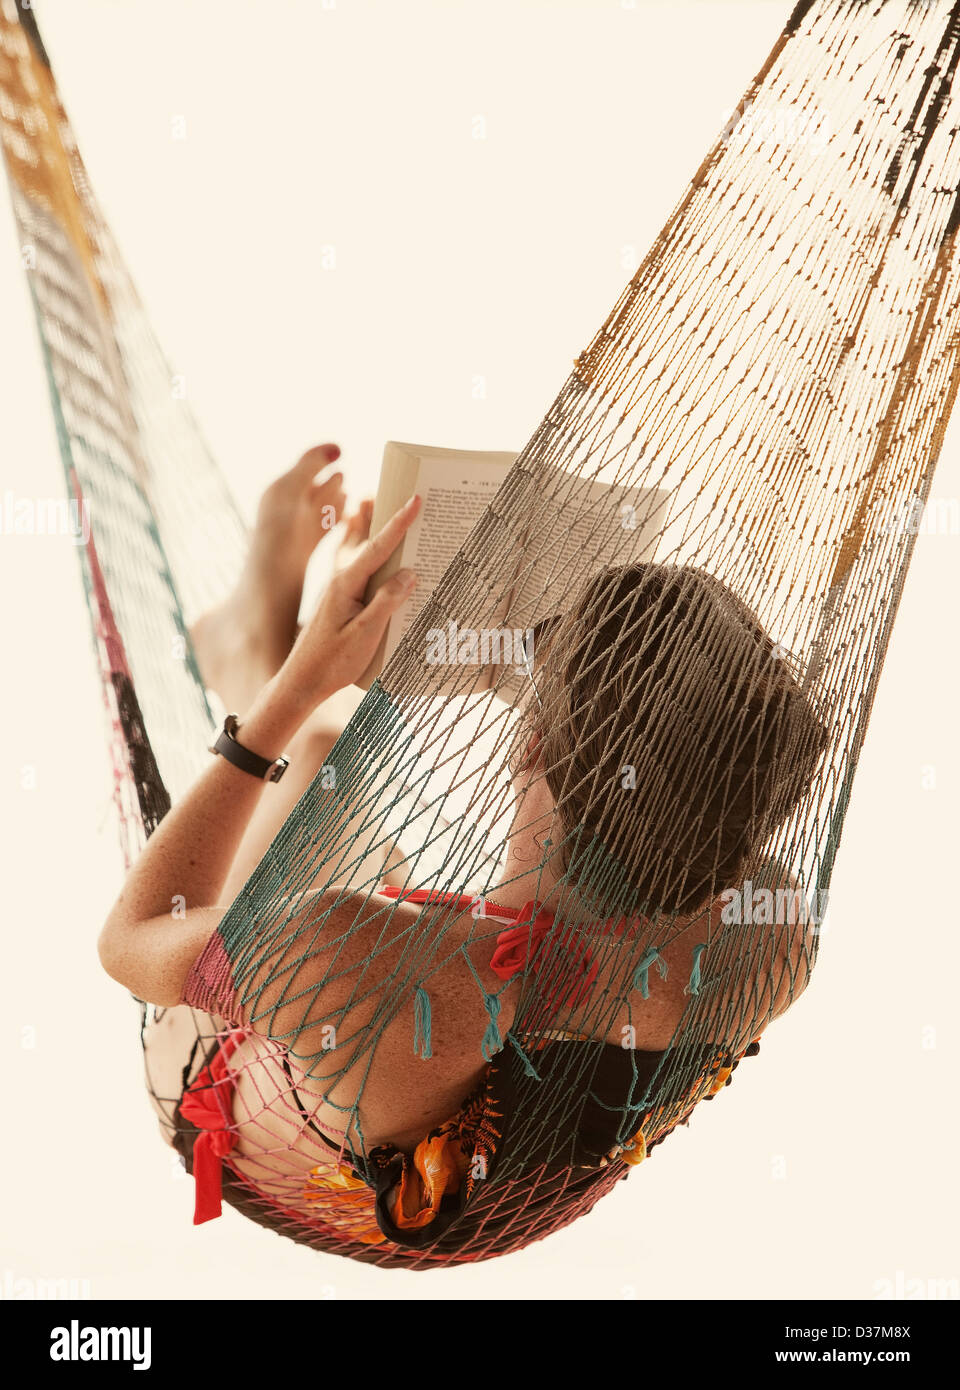 Woman reading book in hammock - Stock Image